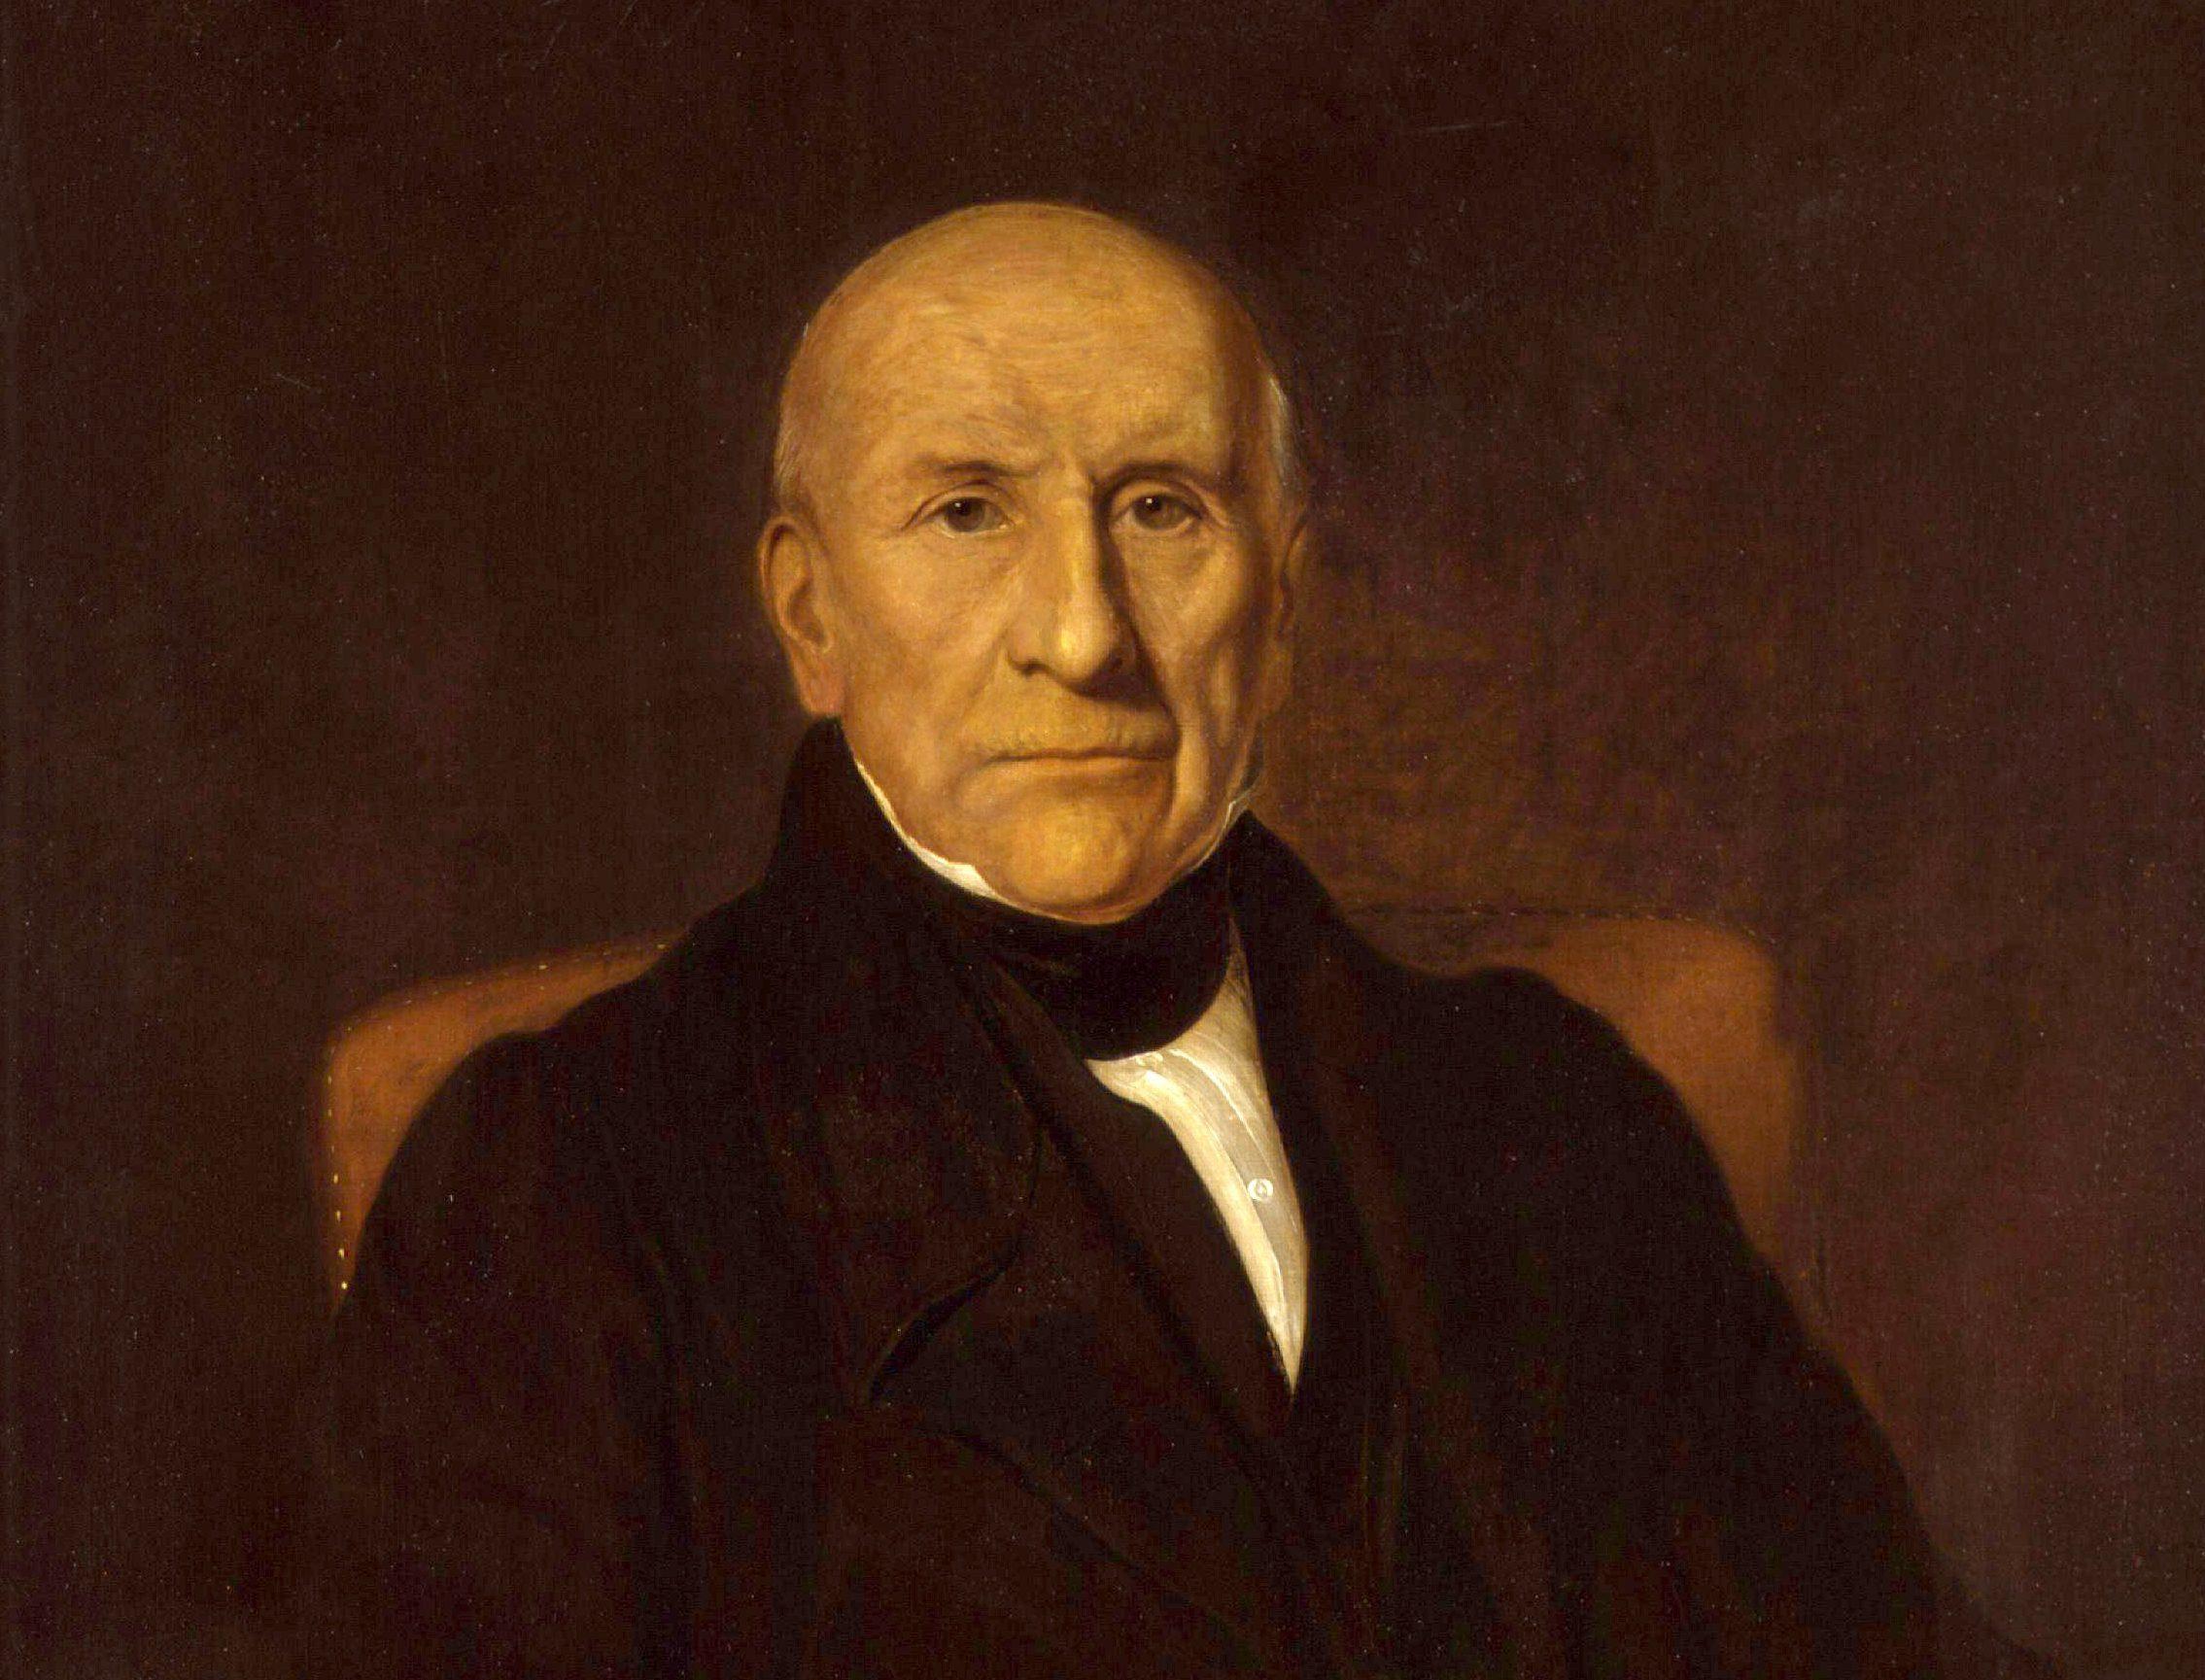 Sir John Gladstone